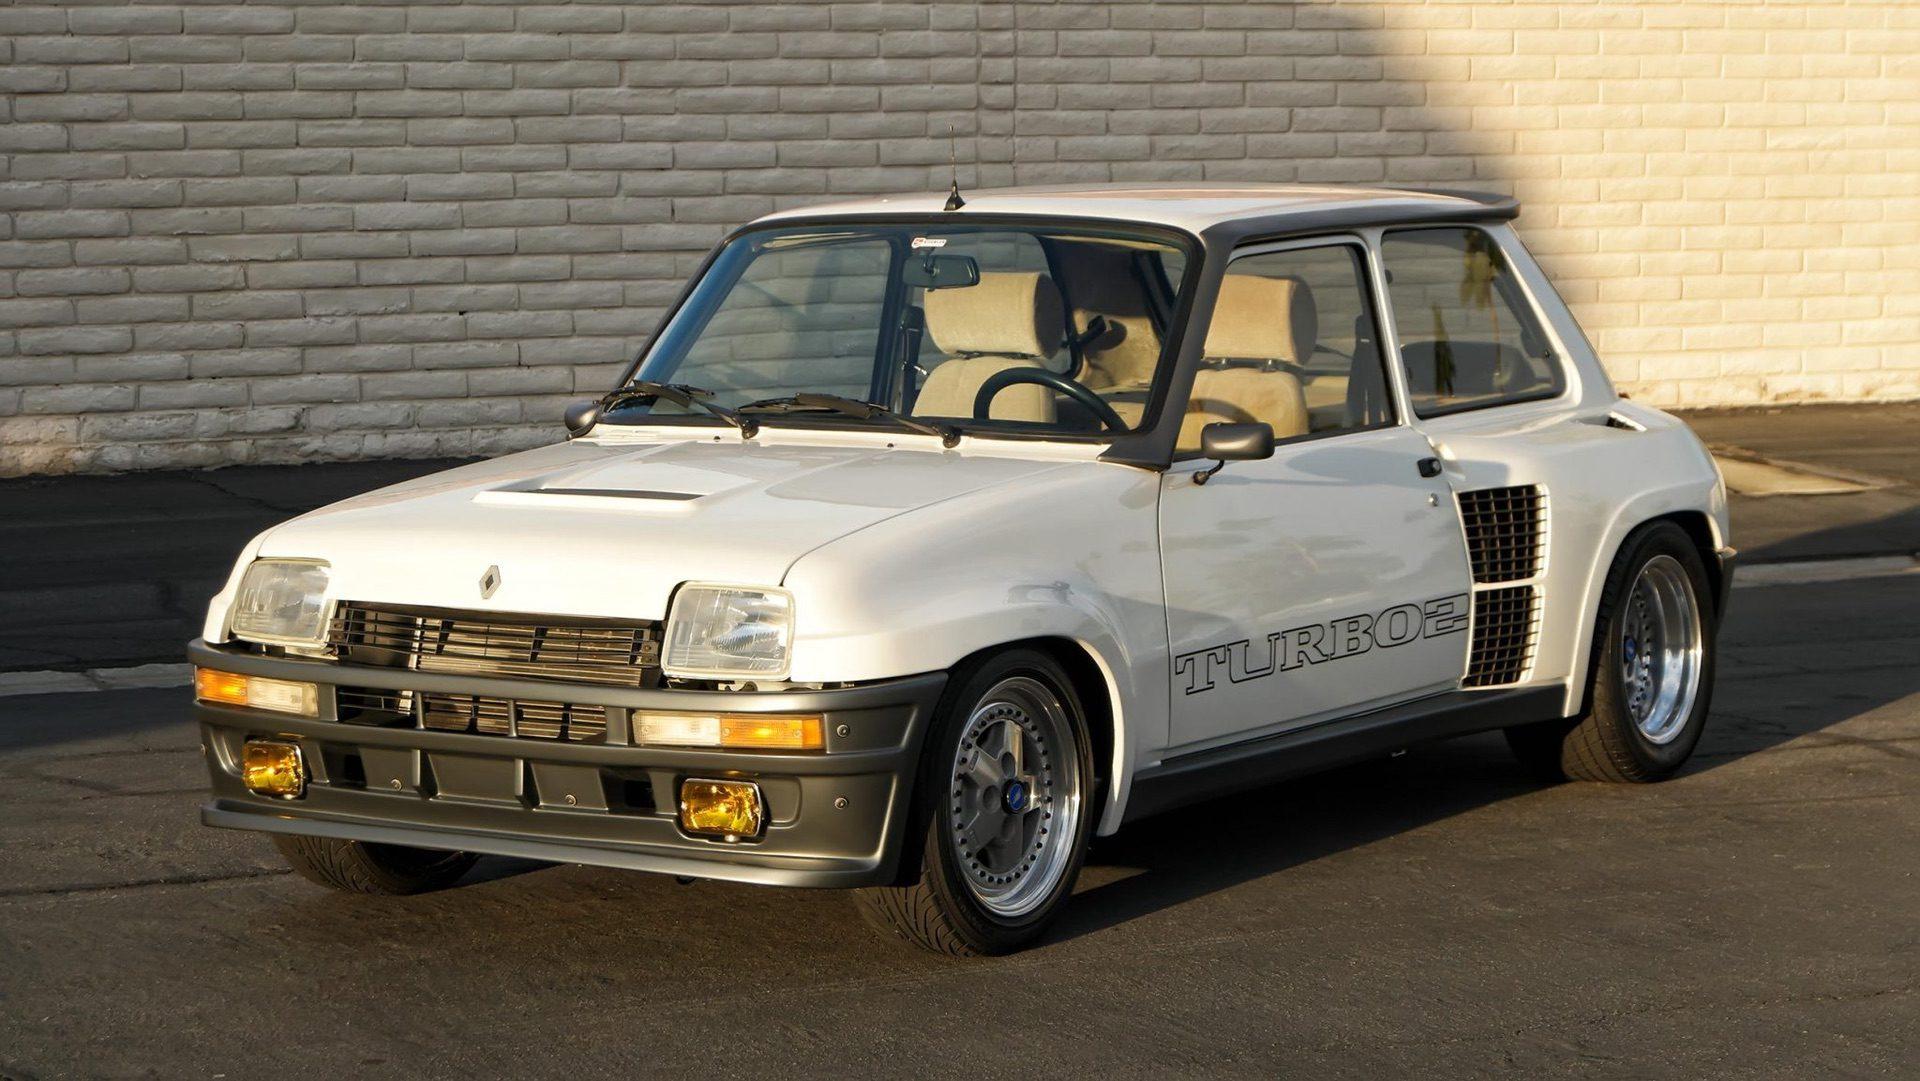 1985_Renault_R5_Turbo_2_rotary-0024